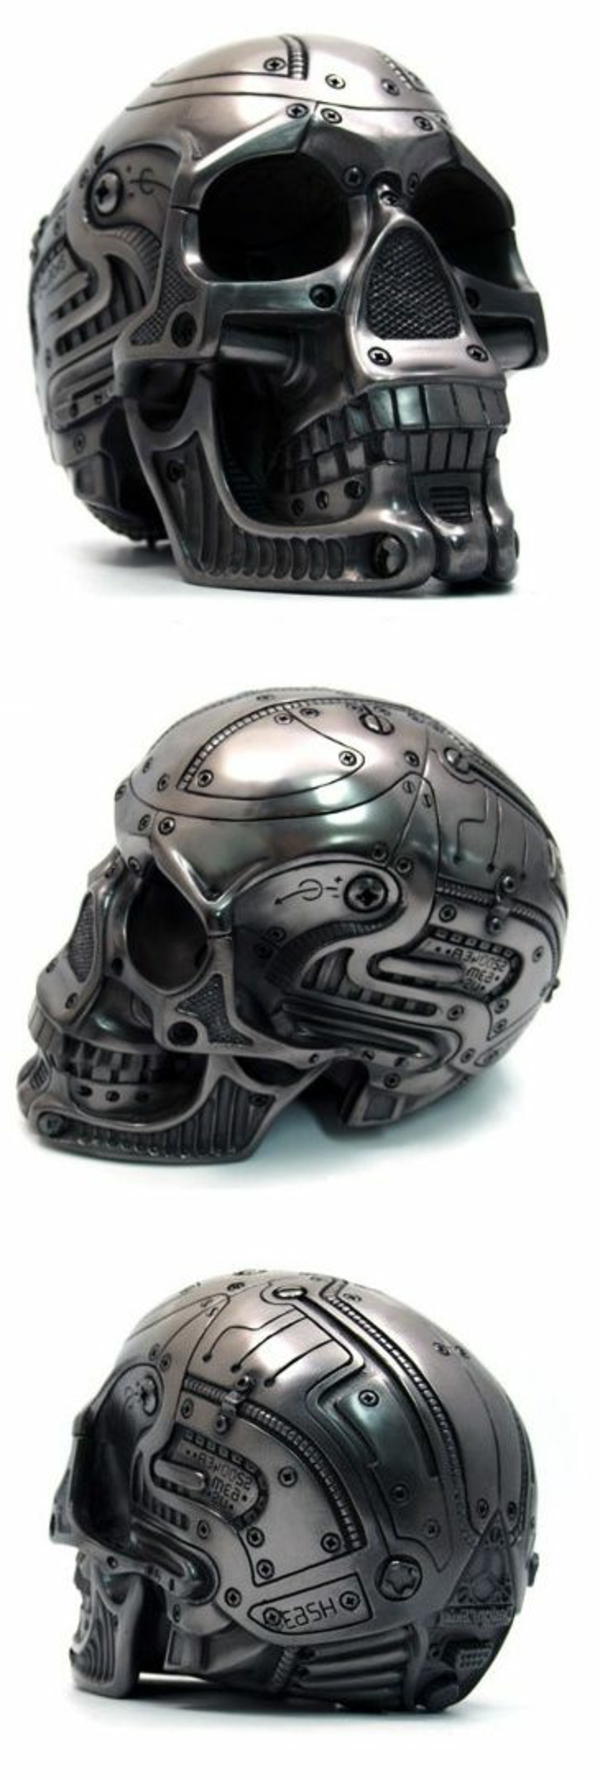 équipement-moto-original-casuqe-de-moto-confortable-squeleton